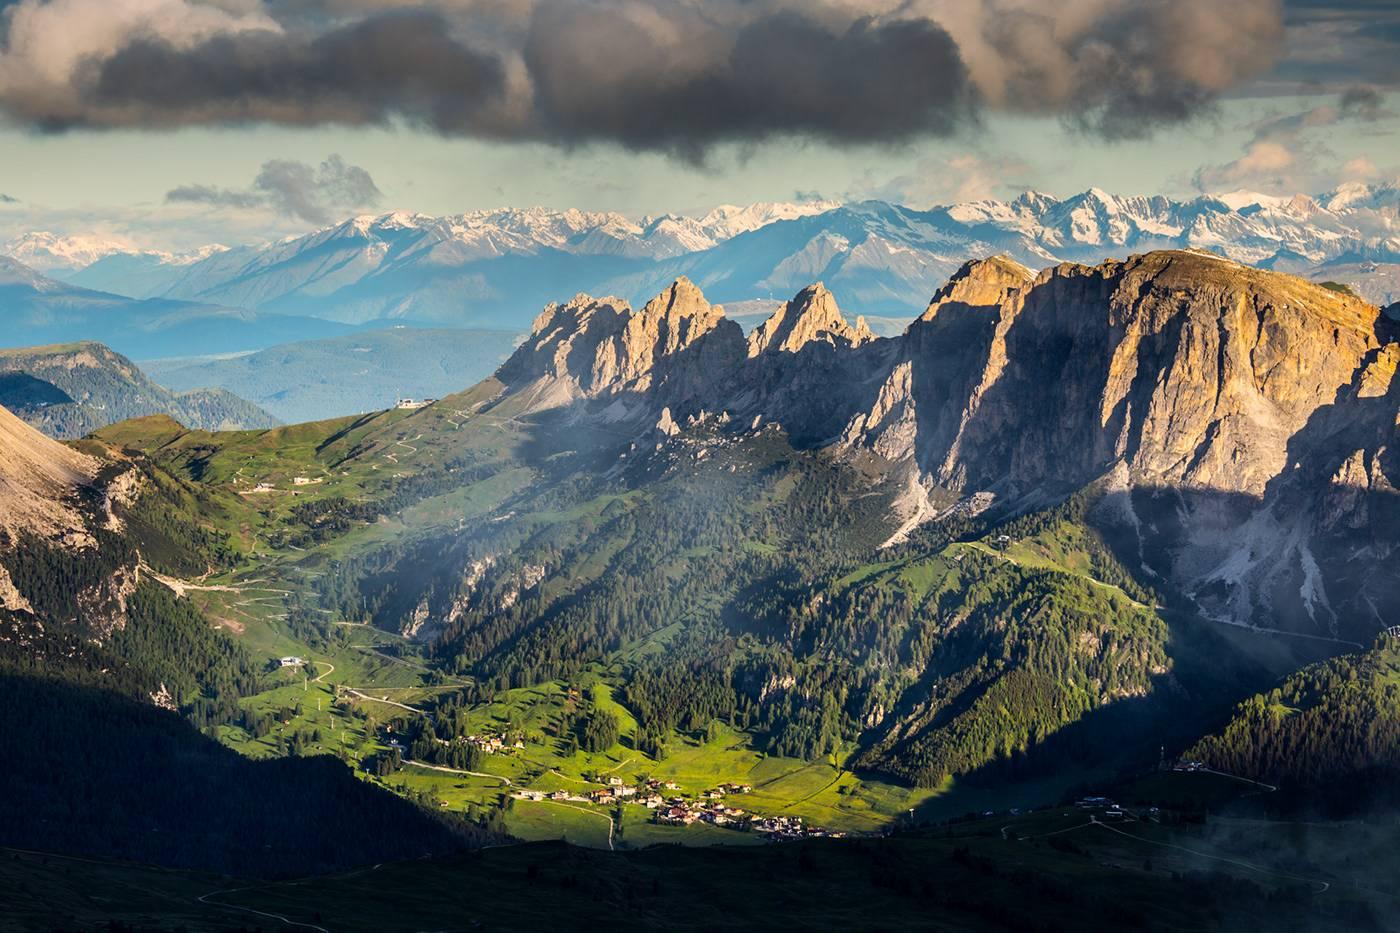 beautiful landscape photography italy by mikolaj gospodarek